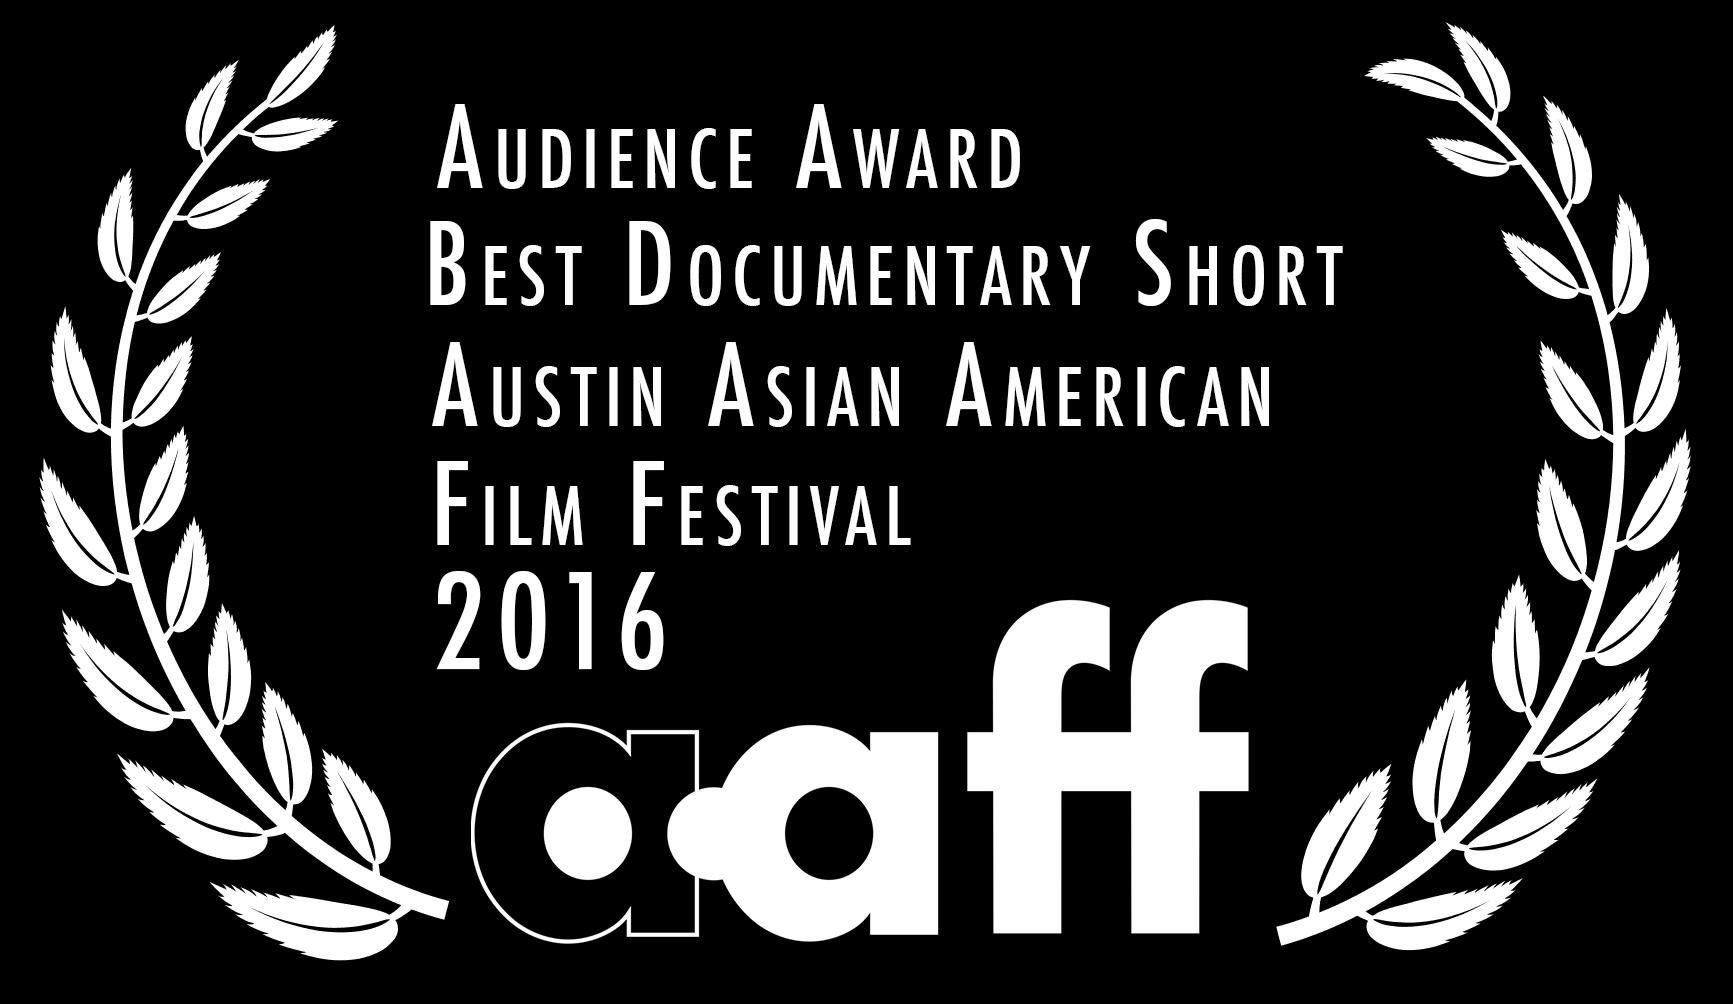 aaaff_2016_award_laurels_black_bg_Audience_doc-short.png